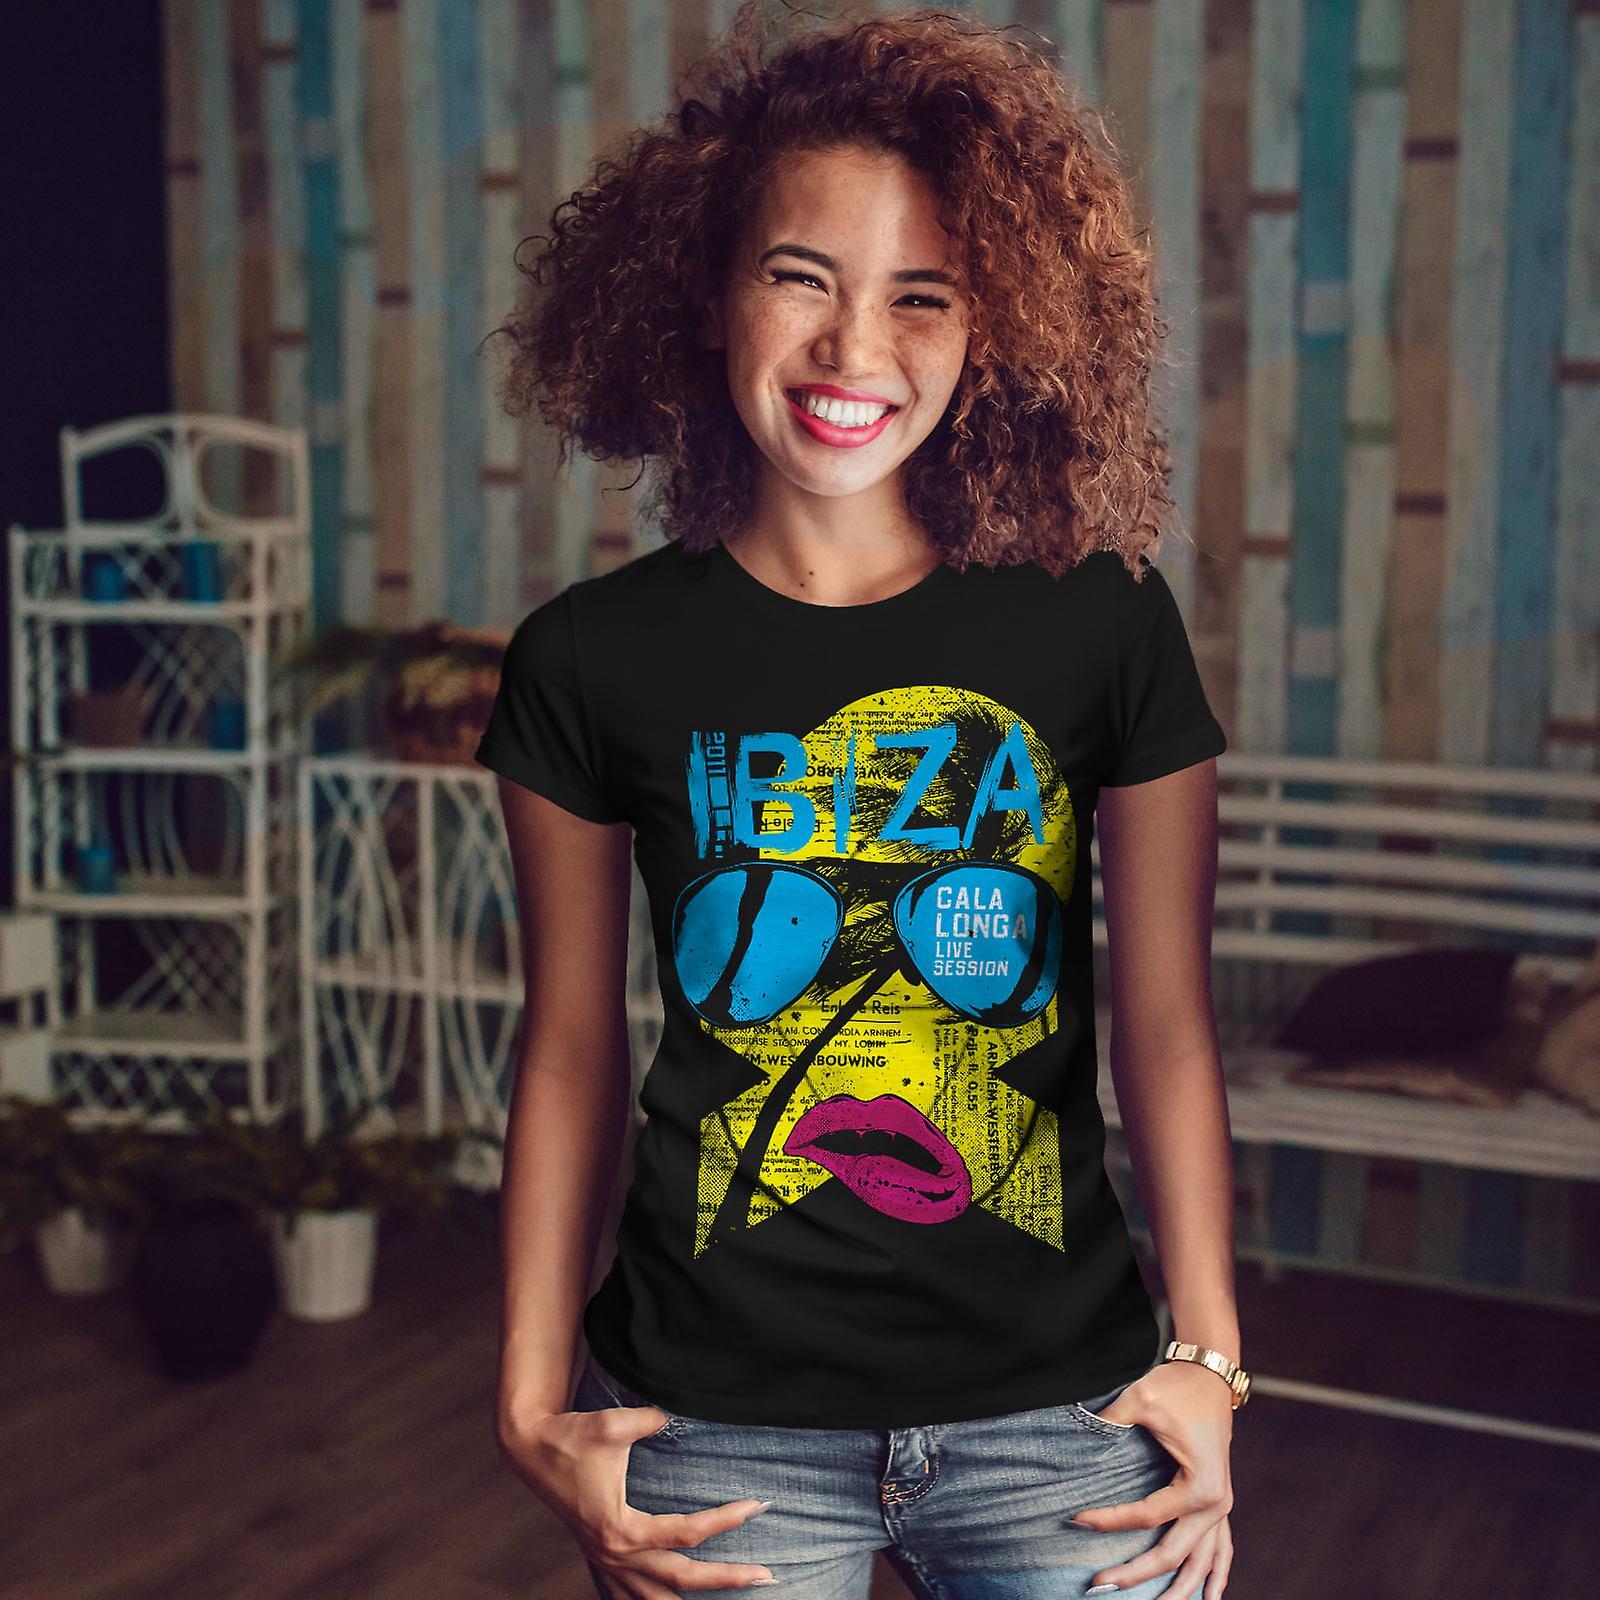 Ibiza Gala Longa Holiday kvinnor svart T-shirt | Wellcoda